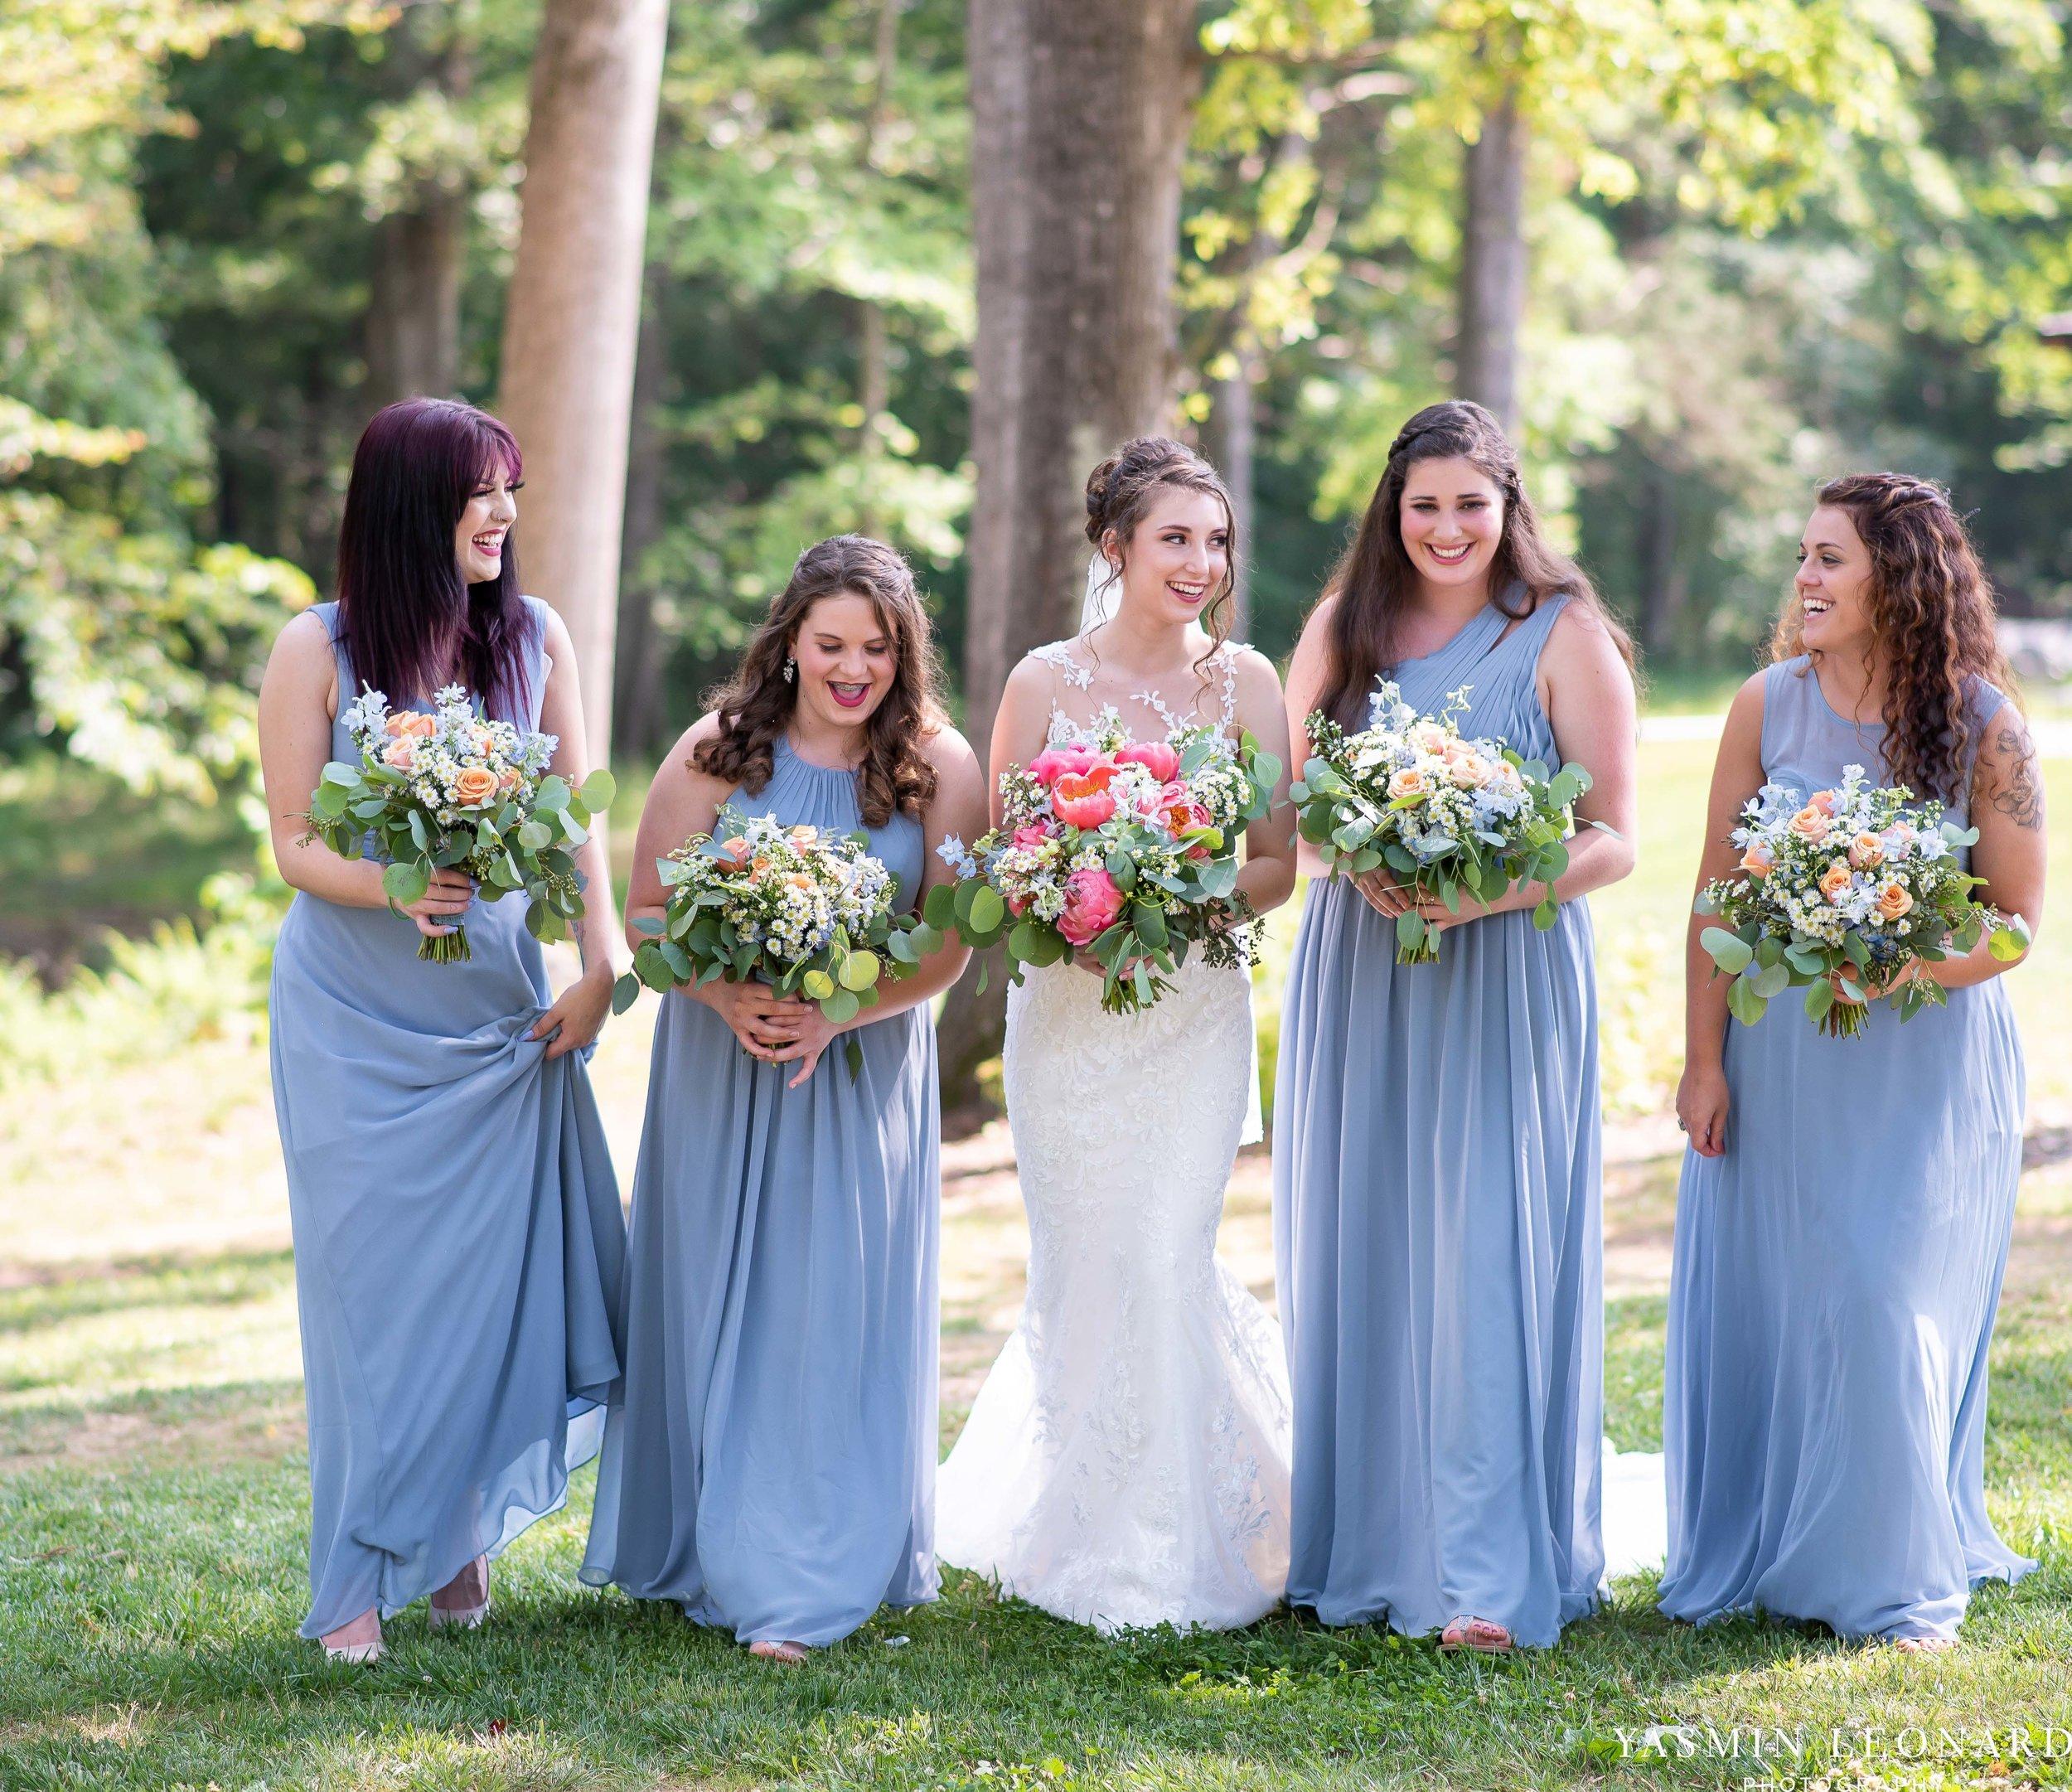 Old Homeplace Vineyard - NC Weddings - Outdoor Summer Weddings - Peony Boutique - Vineyard Wedding - NC Photographer - Yasmin Leonard Photography-19.jpg